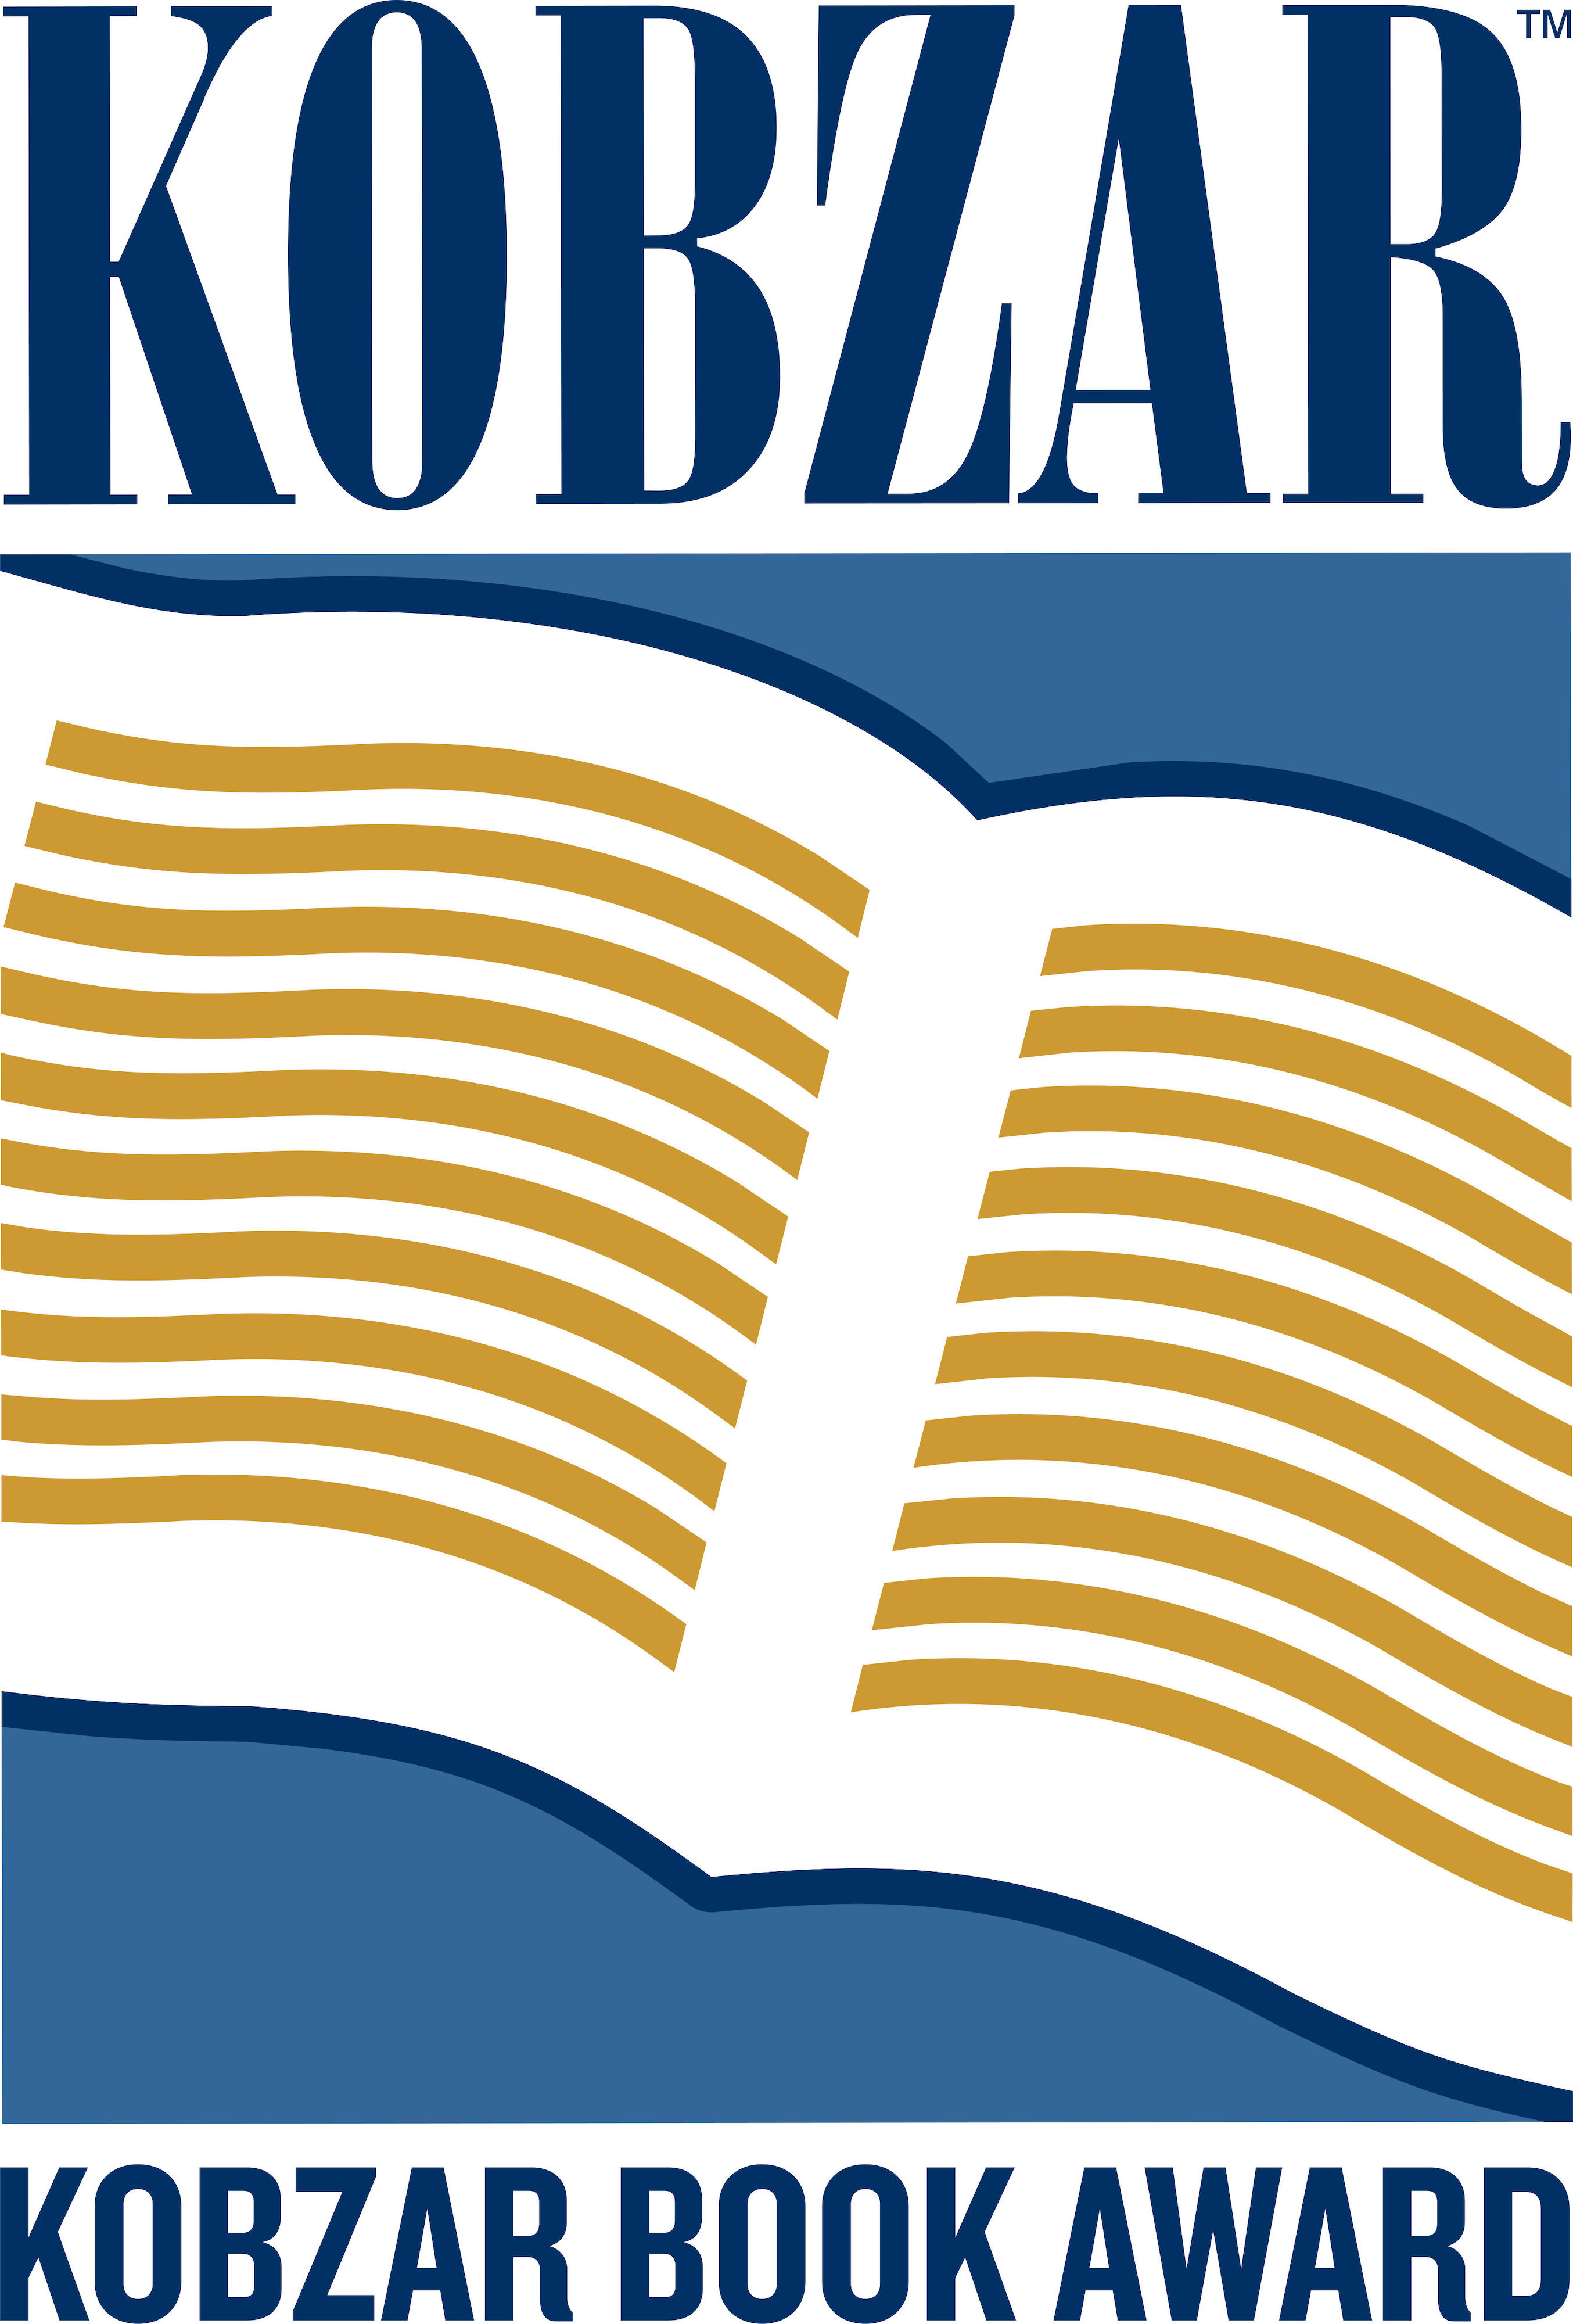 KOBZAR Book Award